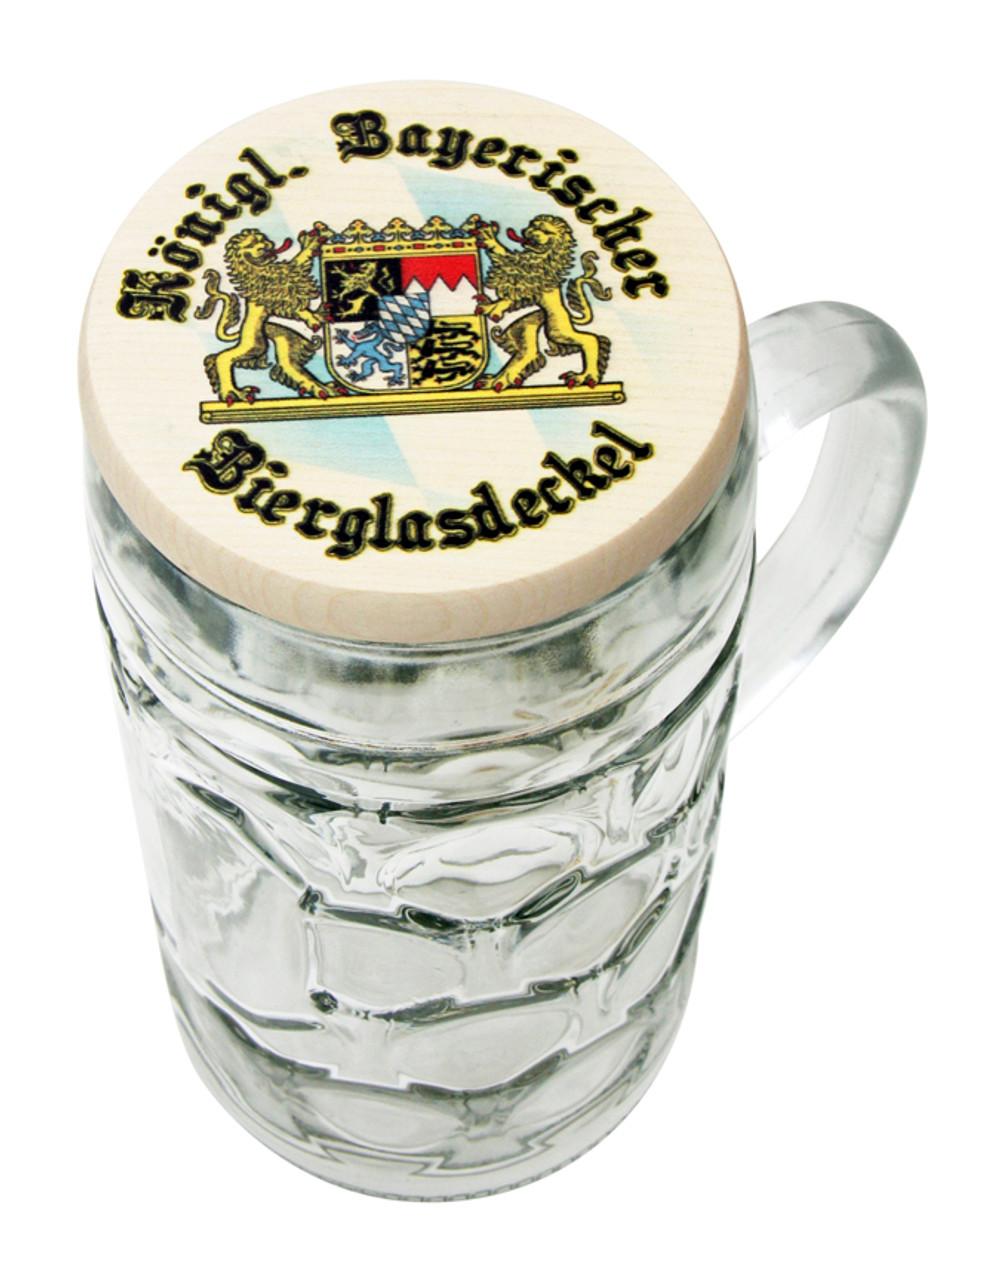 1 Liter Mug not included